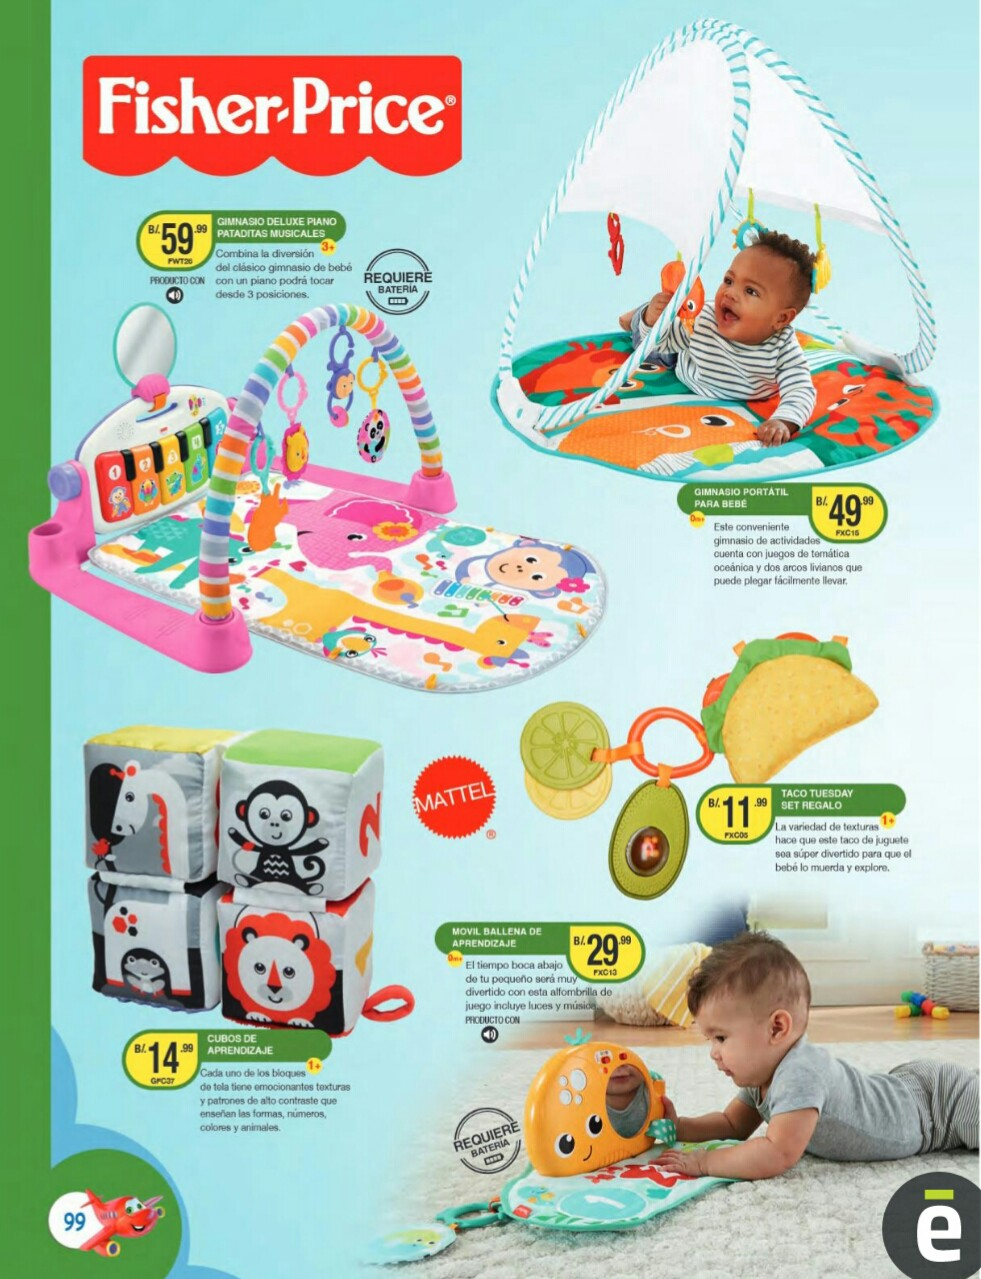 Catalogo juguetes Titan Toys 2019 p99